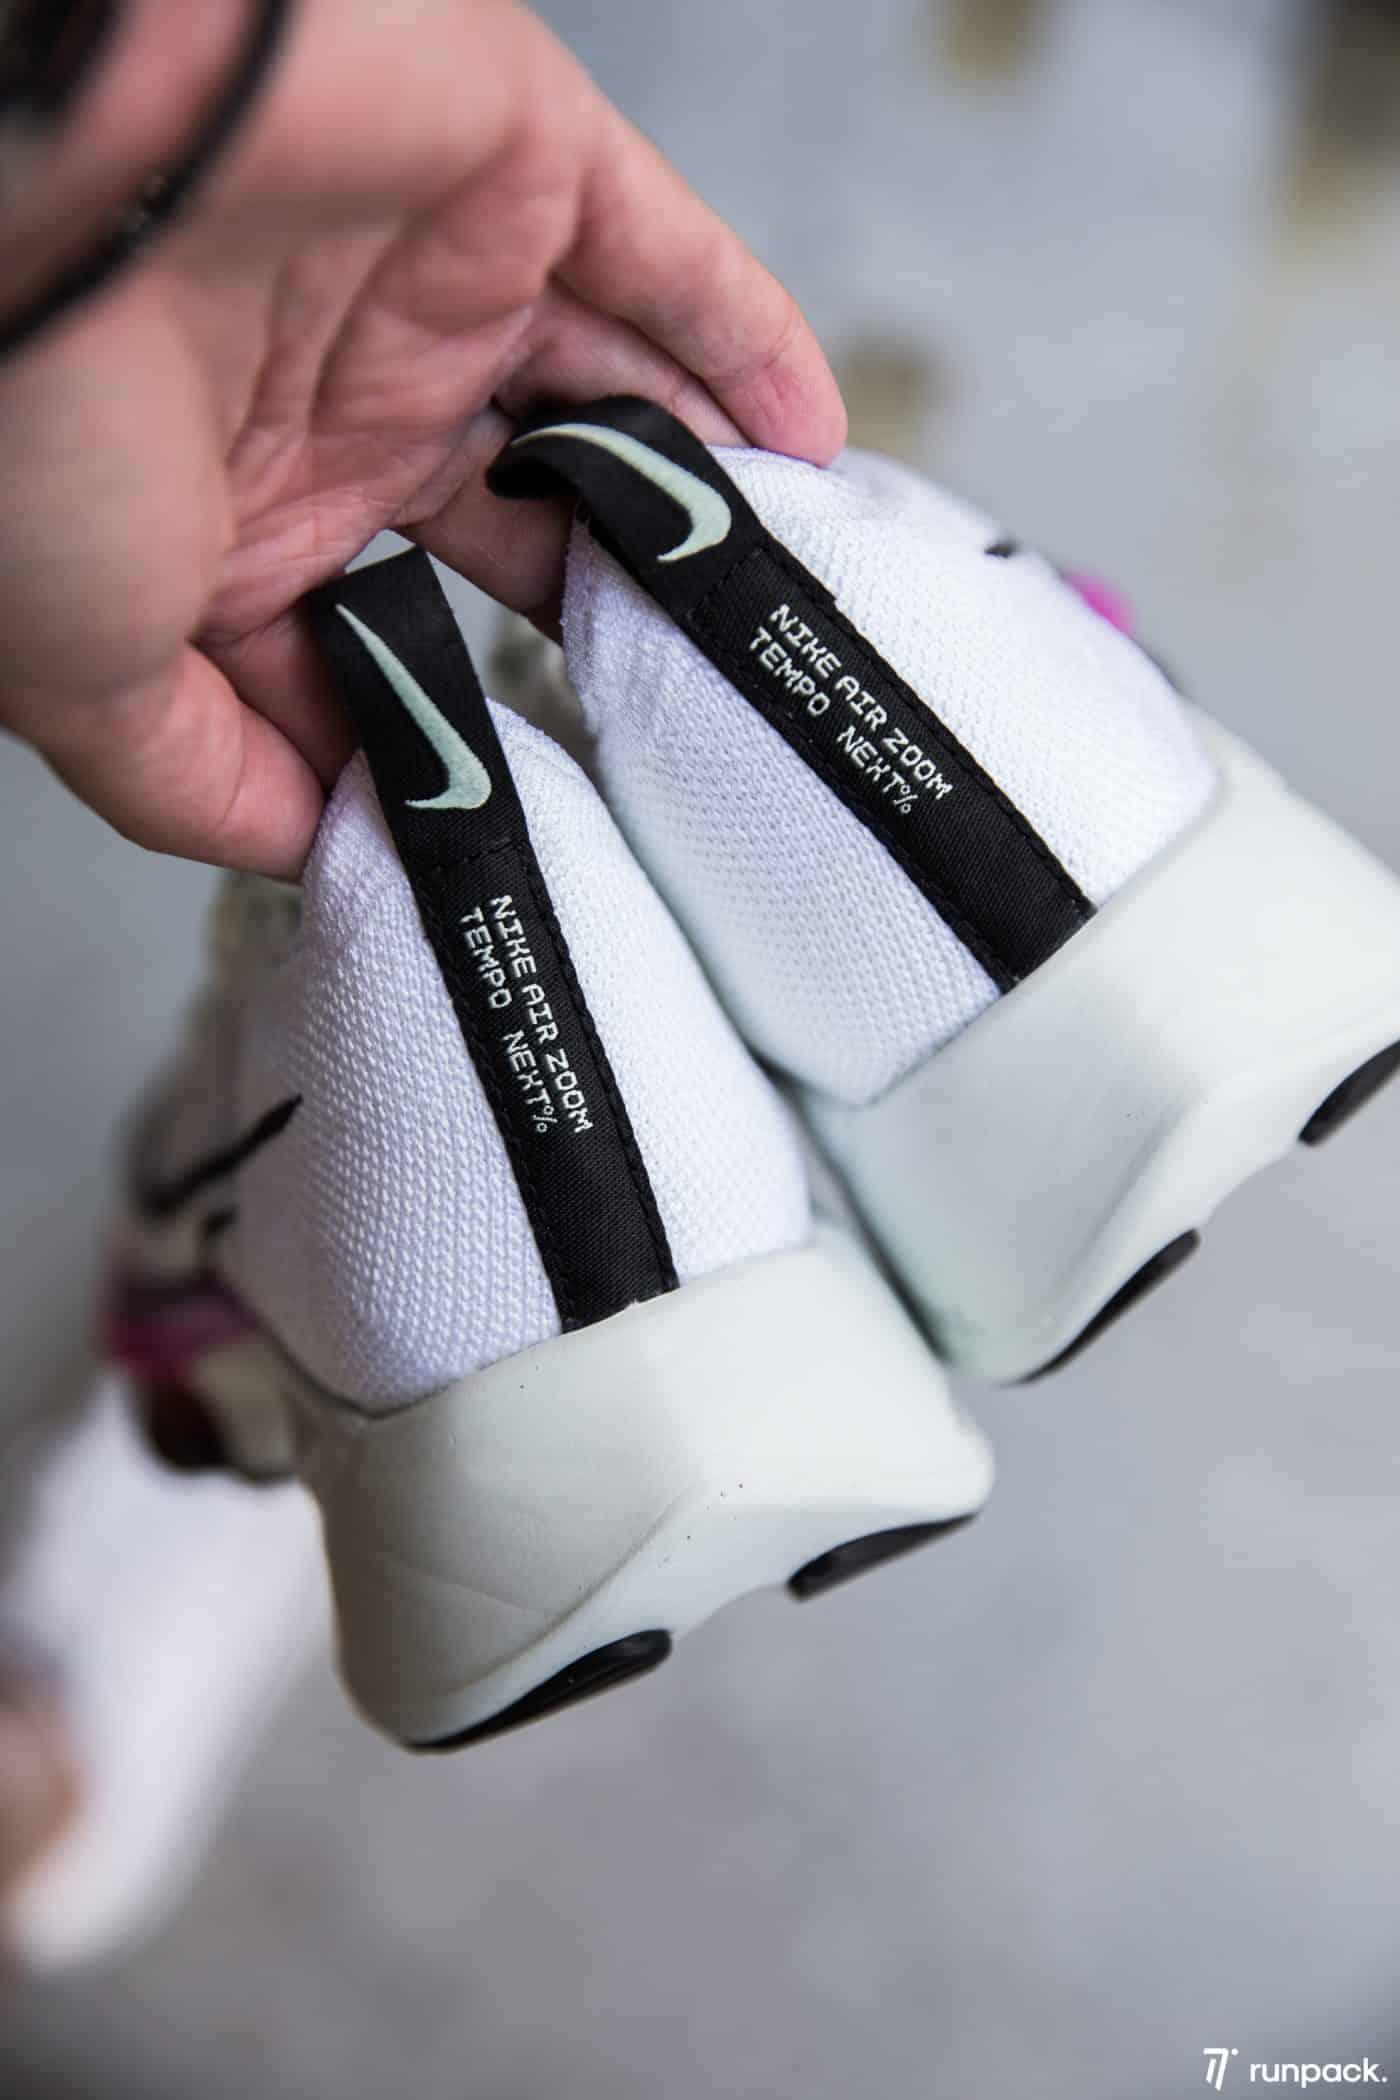 runpack_Nike_Air_Zoom_Tempo_next_2